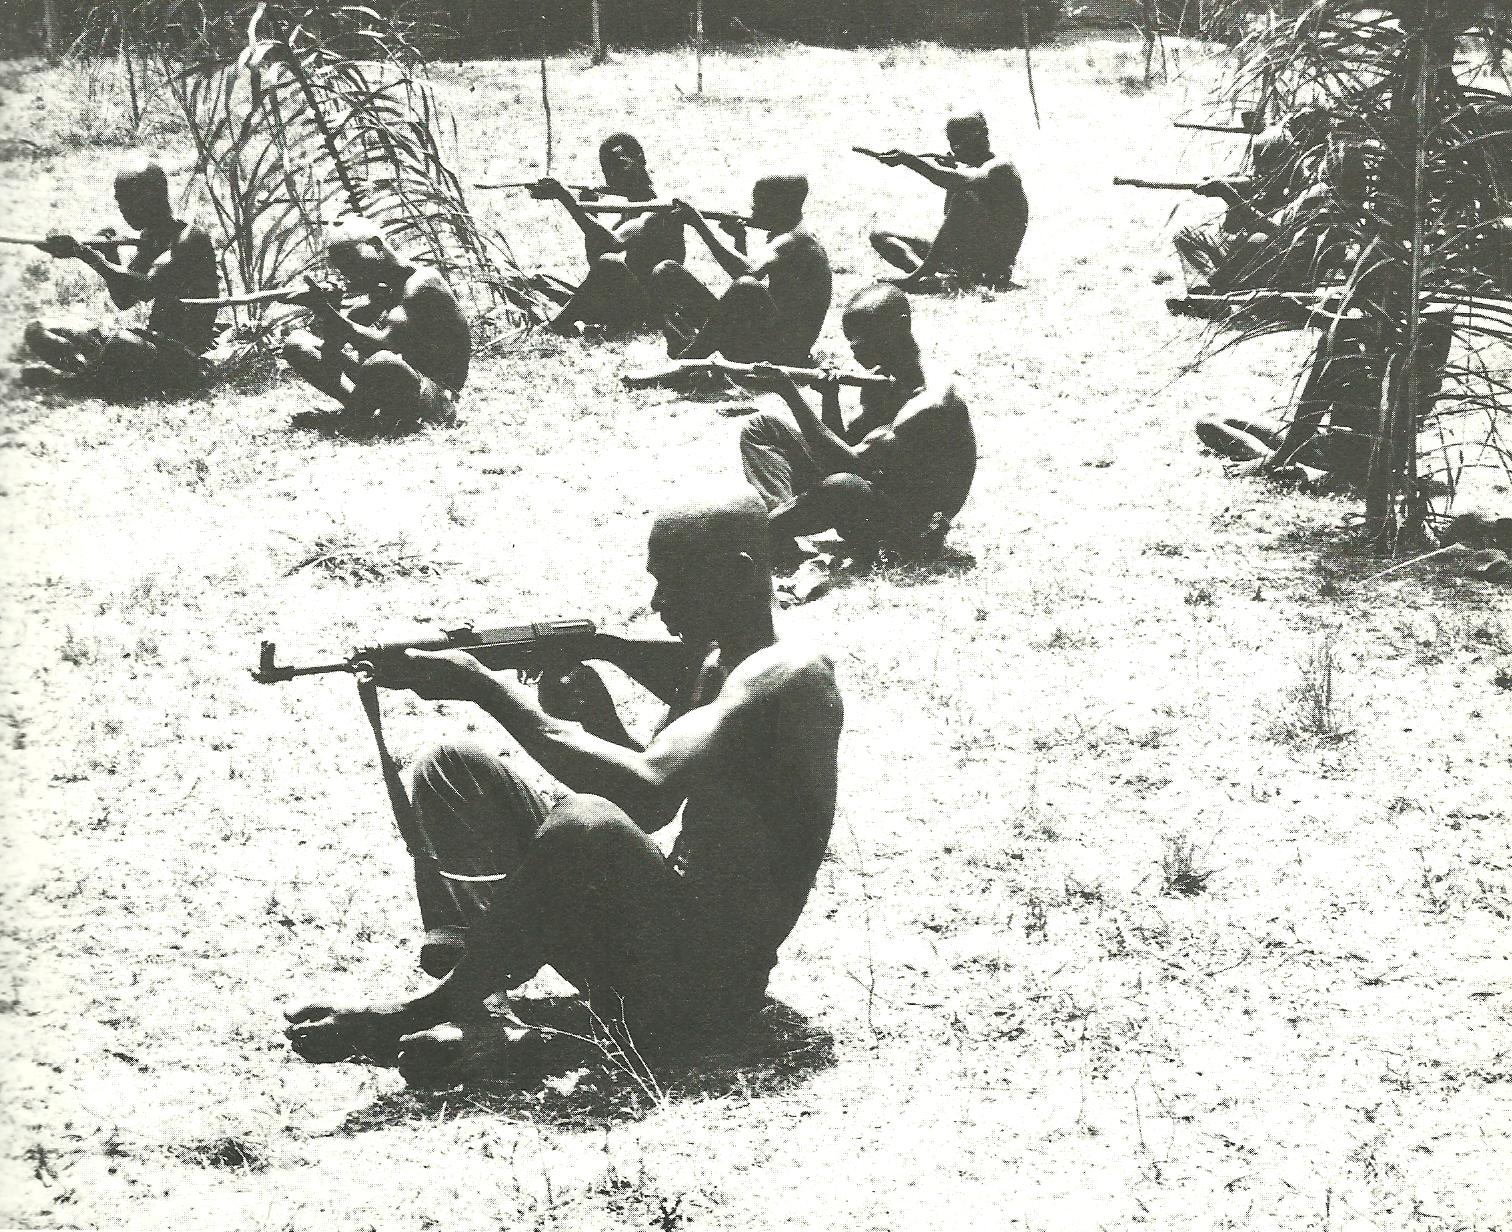 Initially during the Nigerian Civil War the newlyformed Biafran